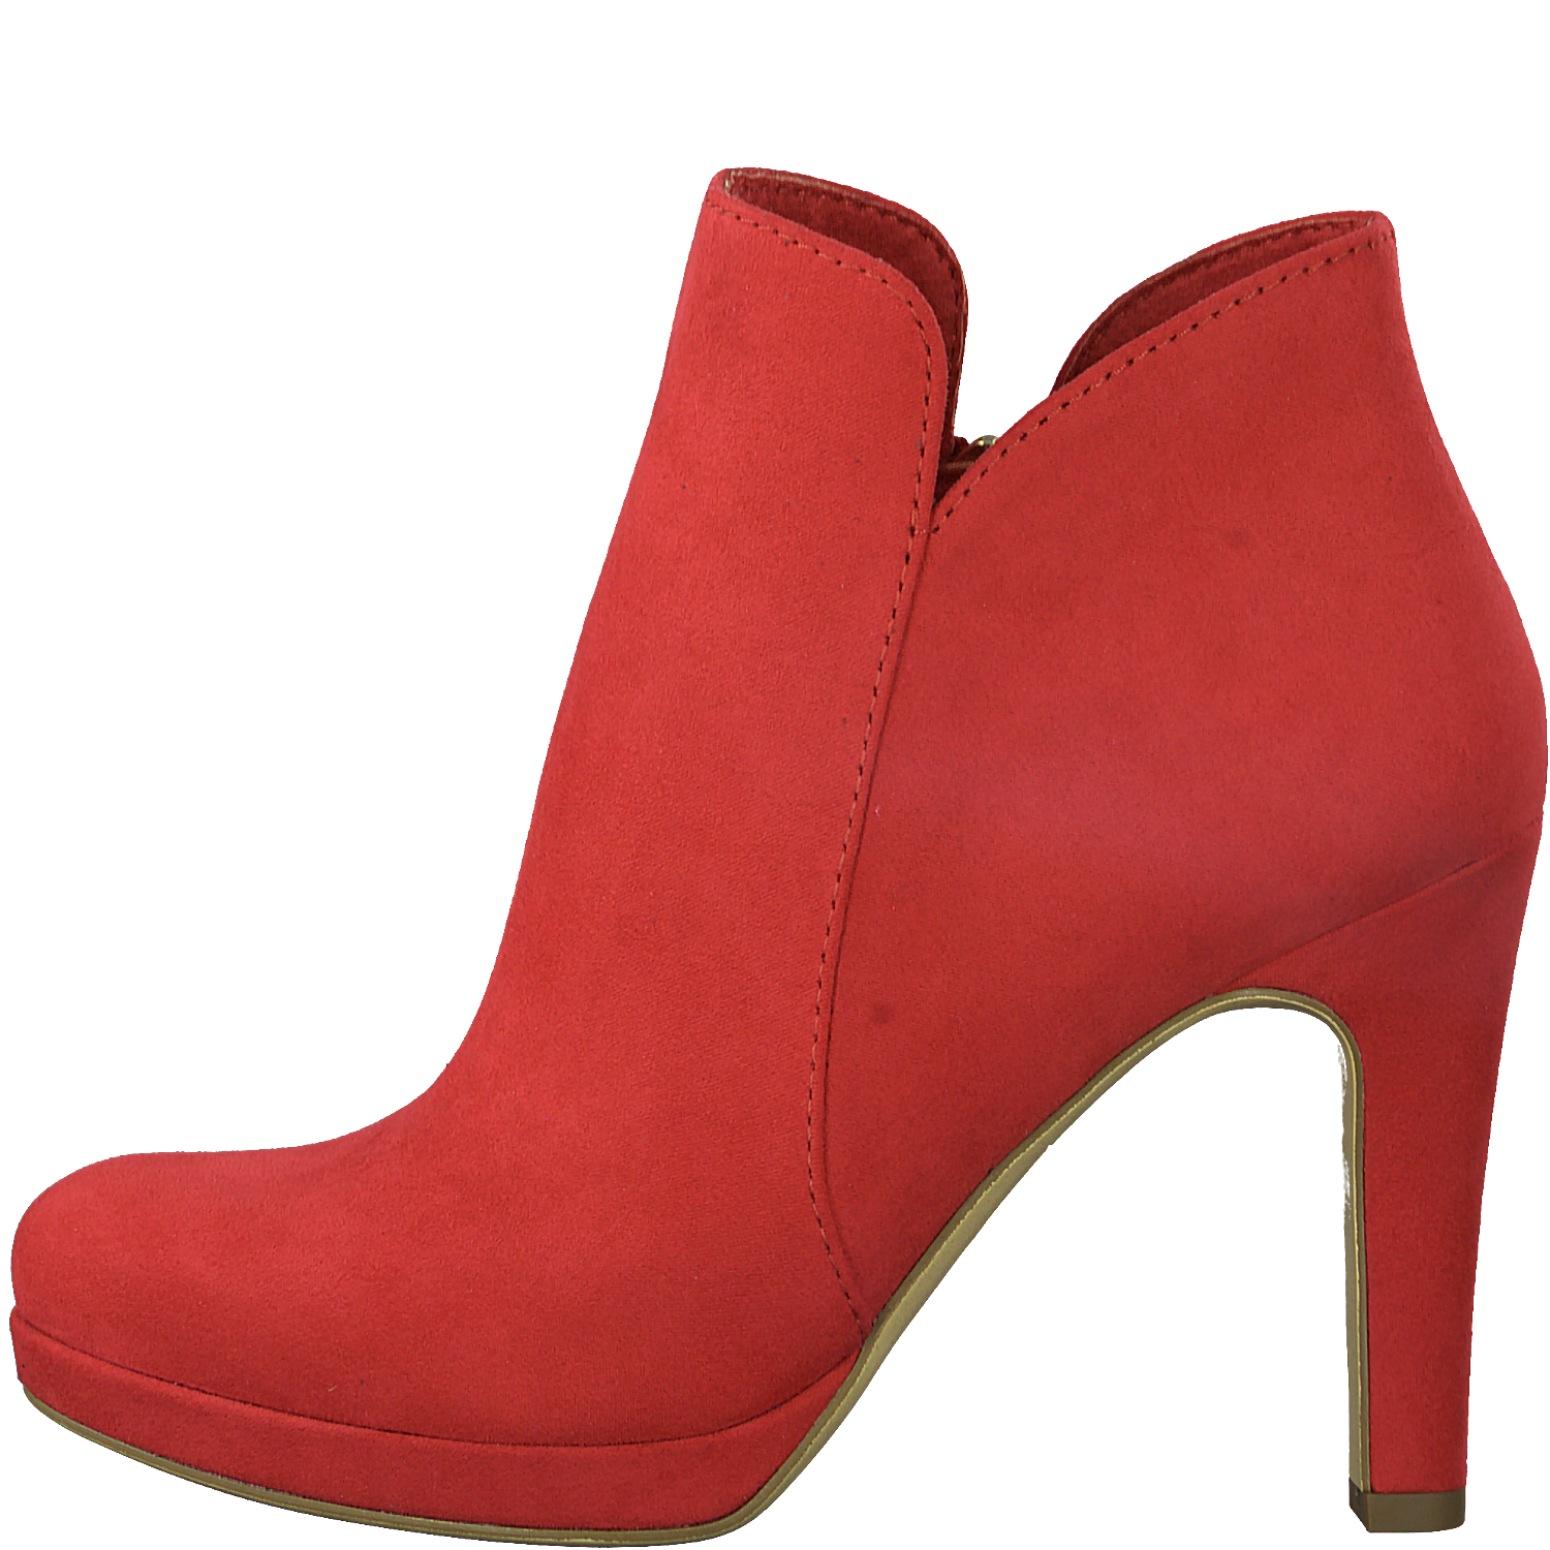 Tamaris Damen 1 25316 23 High Heel Stiefeletten Plateau, Schuhgröße:41 EU, Farbe:Schwarz